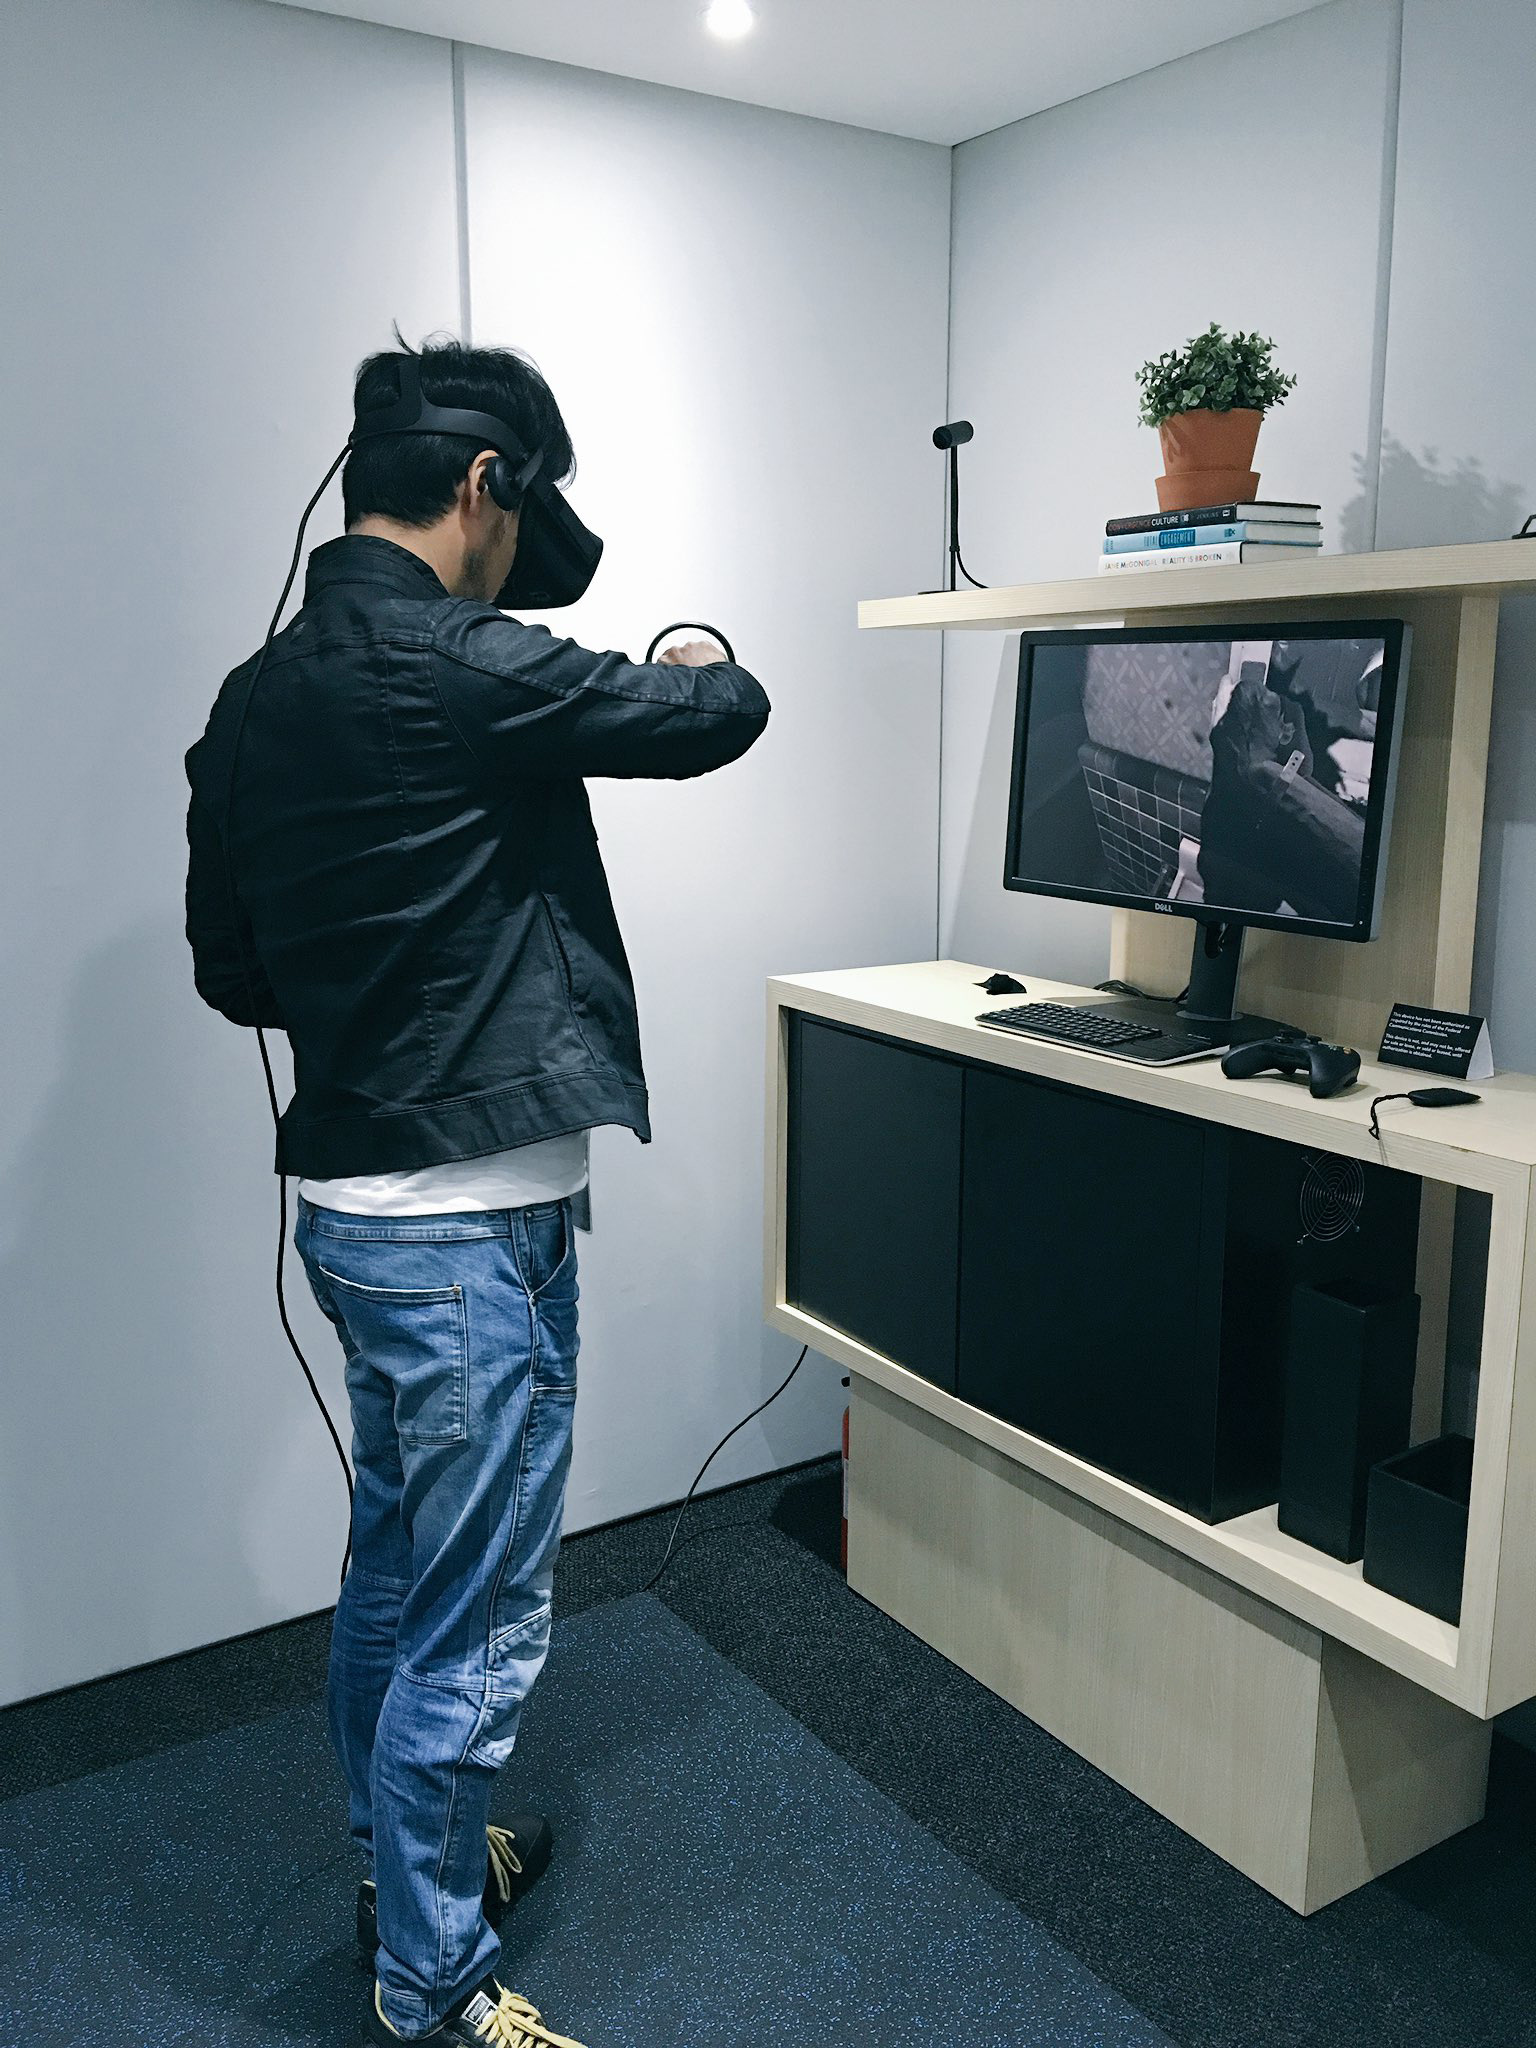 """Hideo Kojima checking out Oculus."" - Ayako"